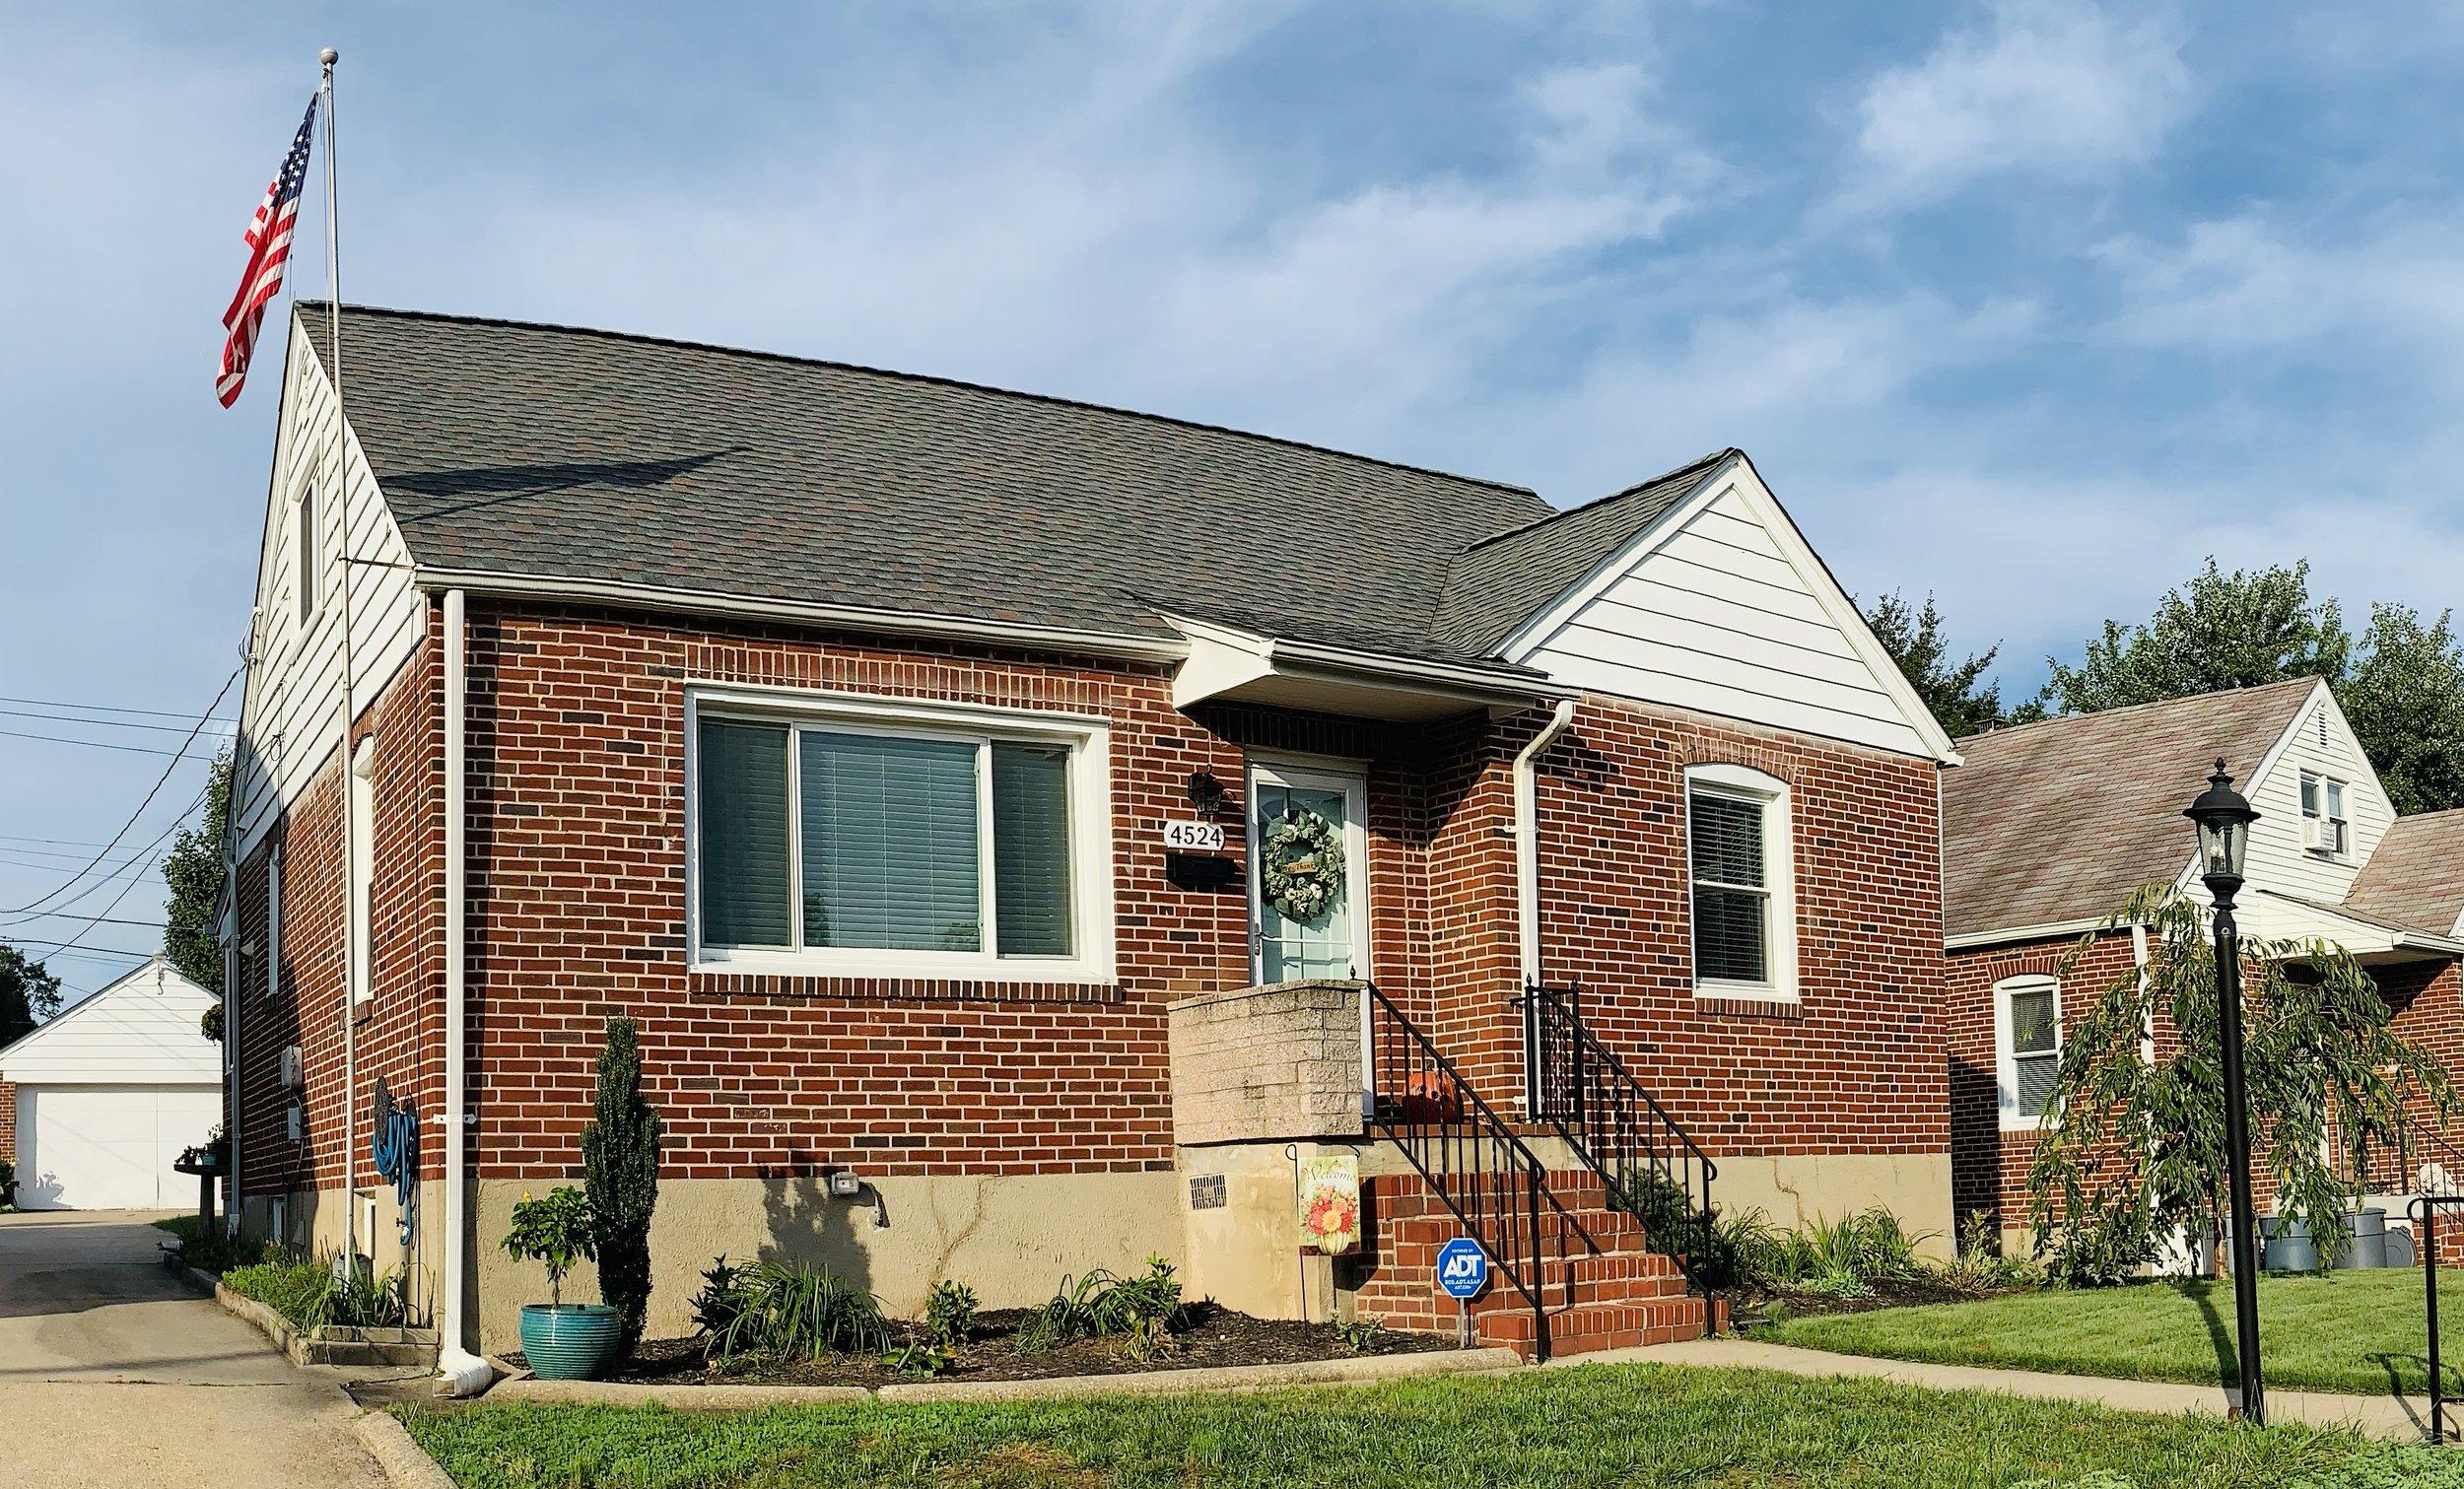 Leak-free, lifetime warranty, and happier household.